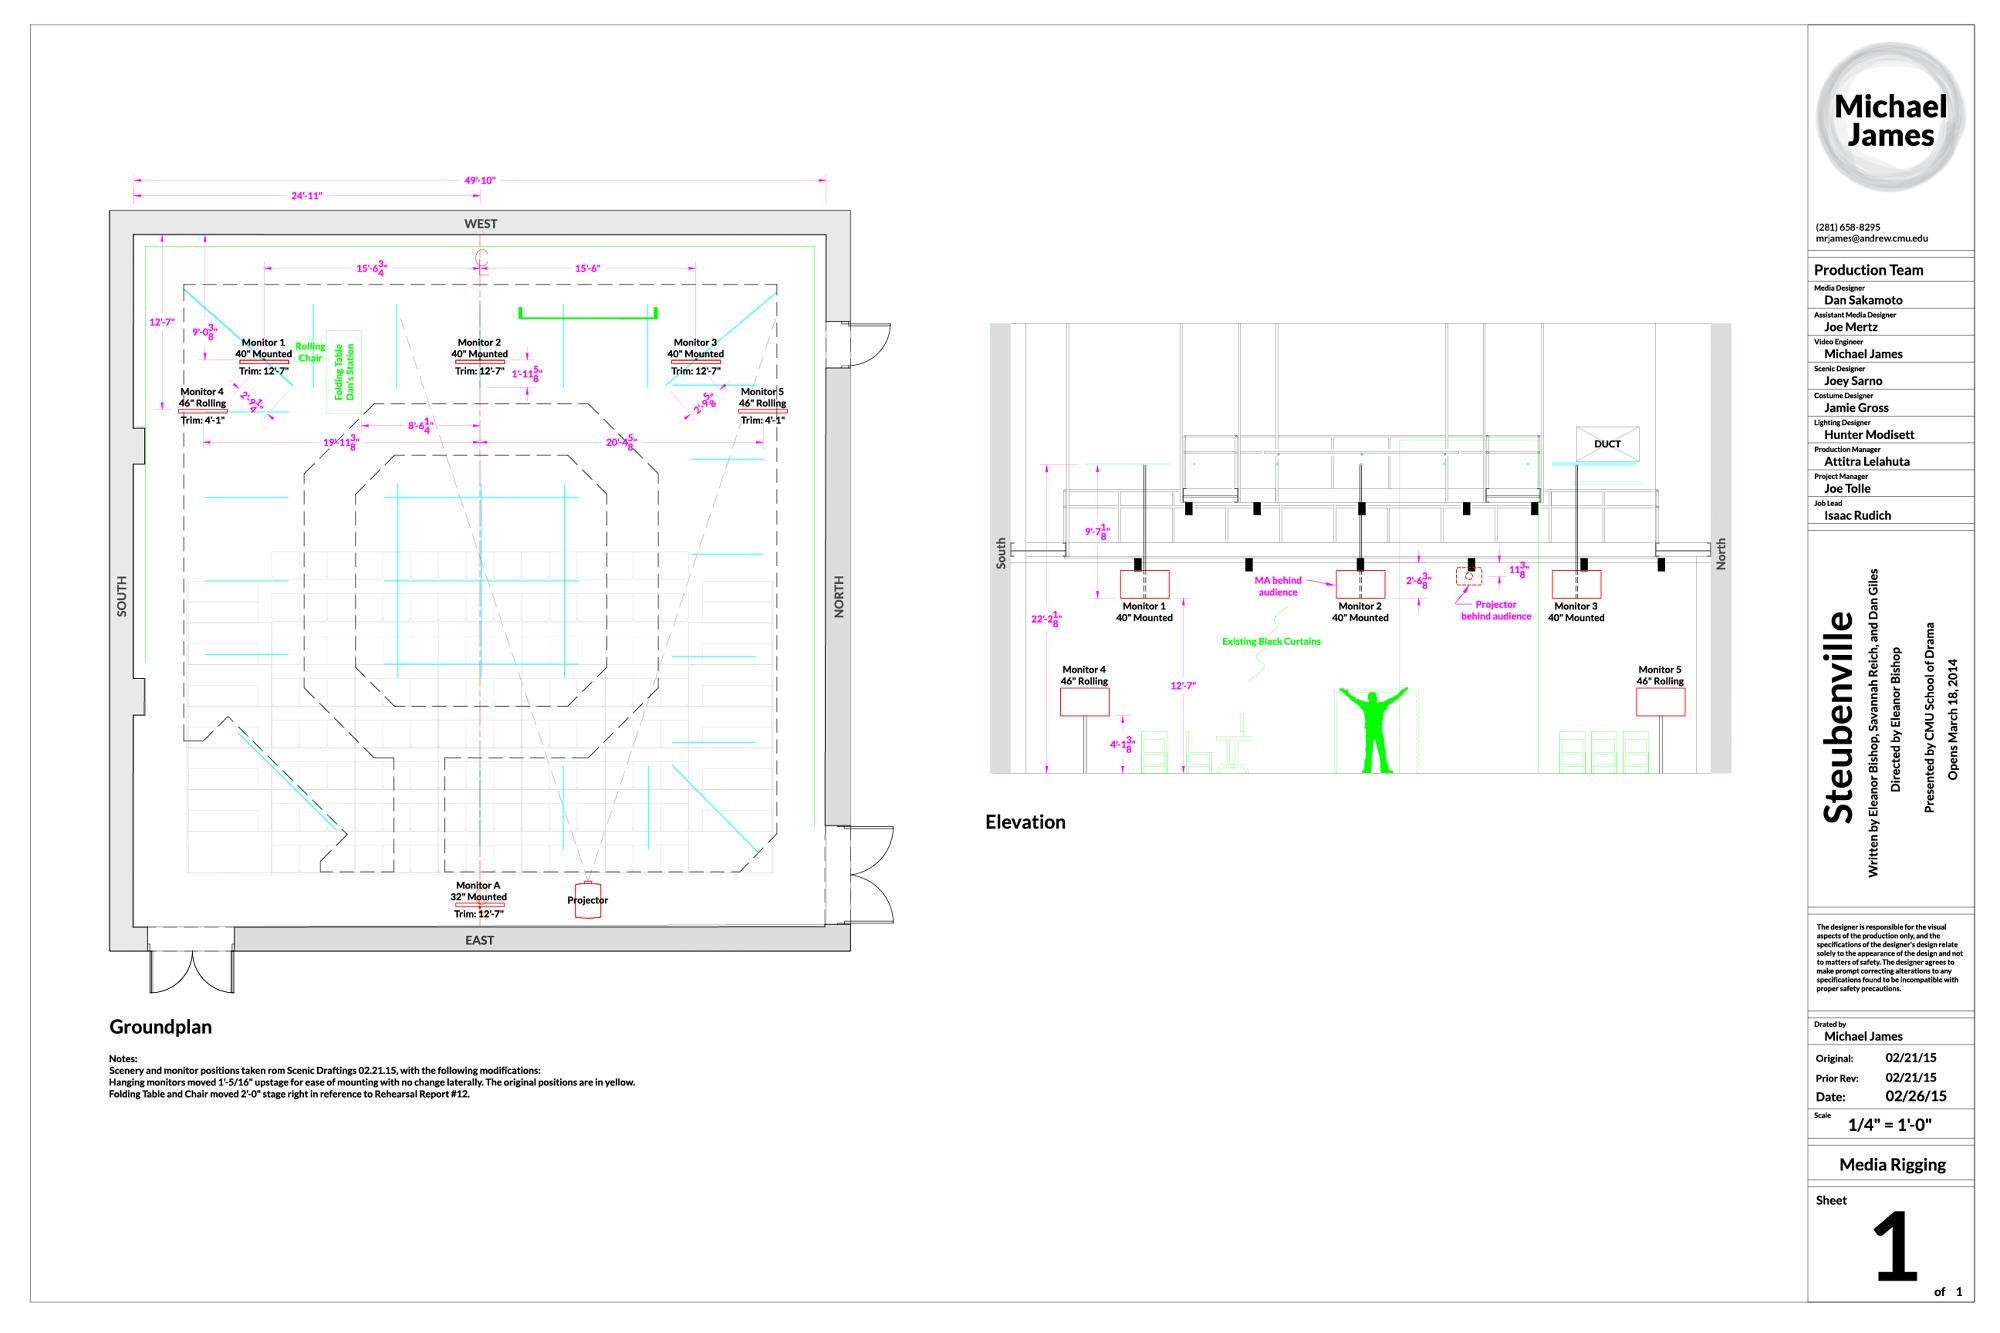 Steubenville Media Groundplan & Elevation (role: Video Engineer)